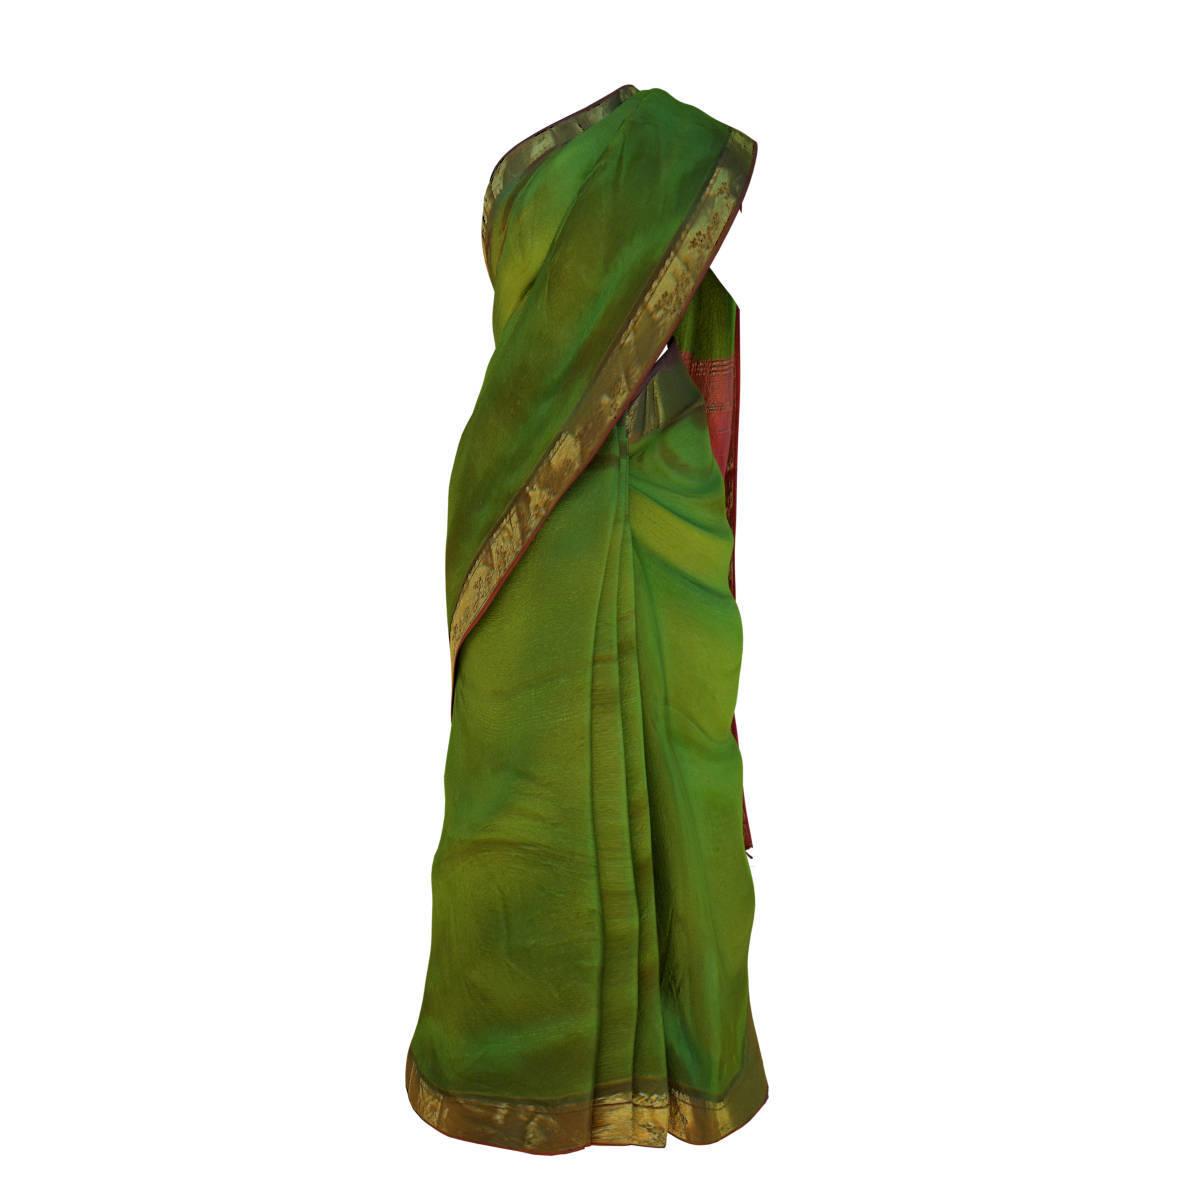 Tomtalented sari model 1 219814e8 jaub